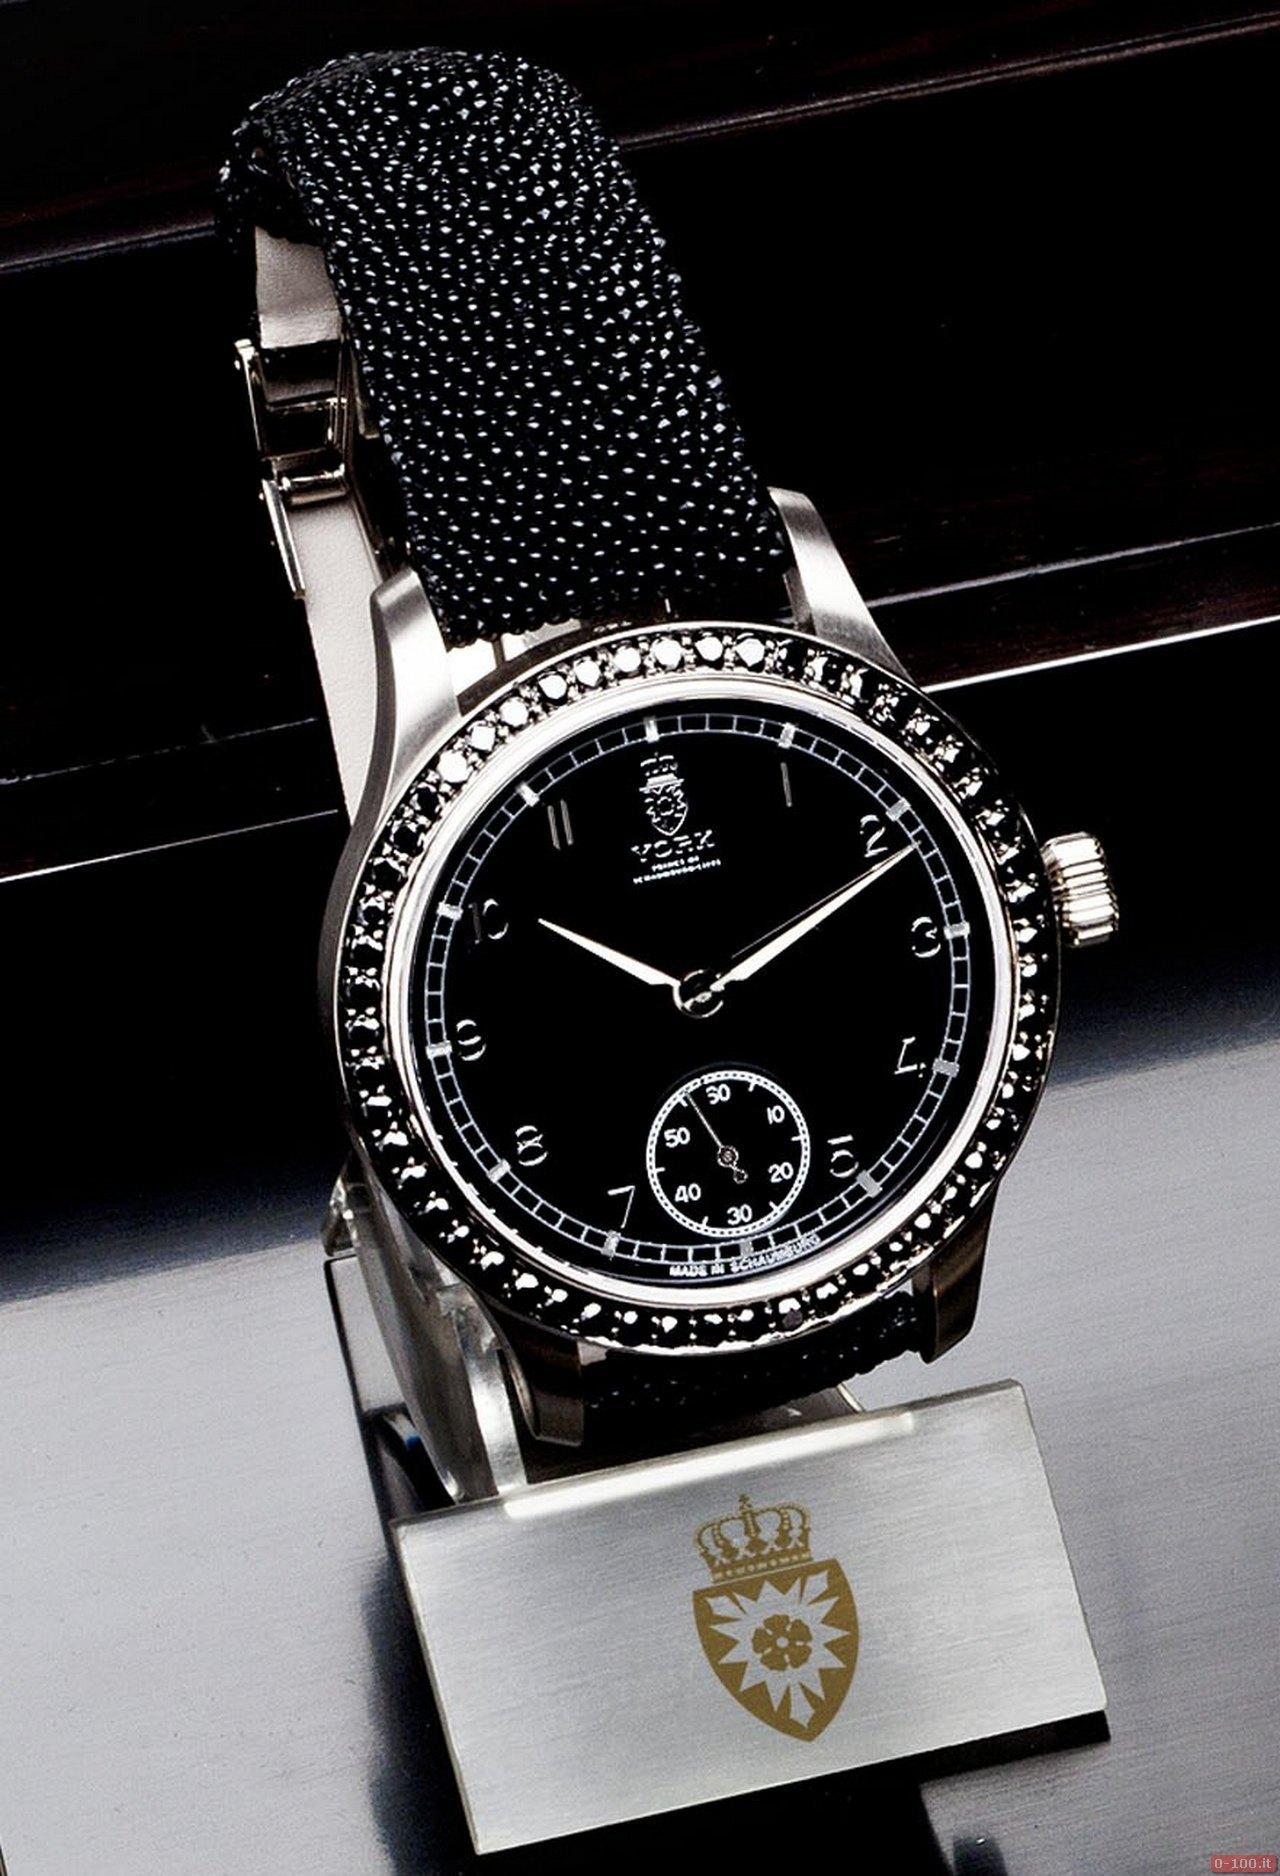 anteprima-baselworld-2013-york-royal-black-caviar_0-100 6